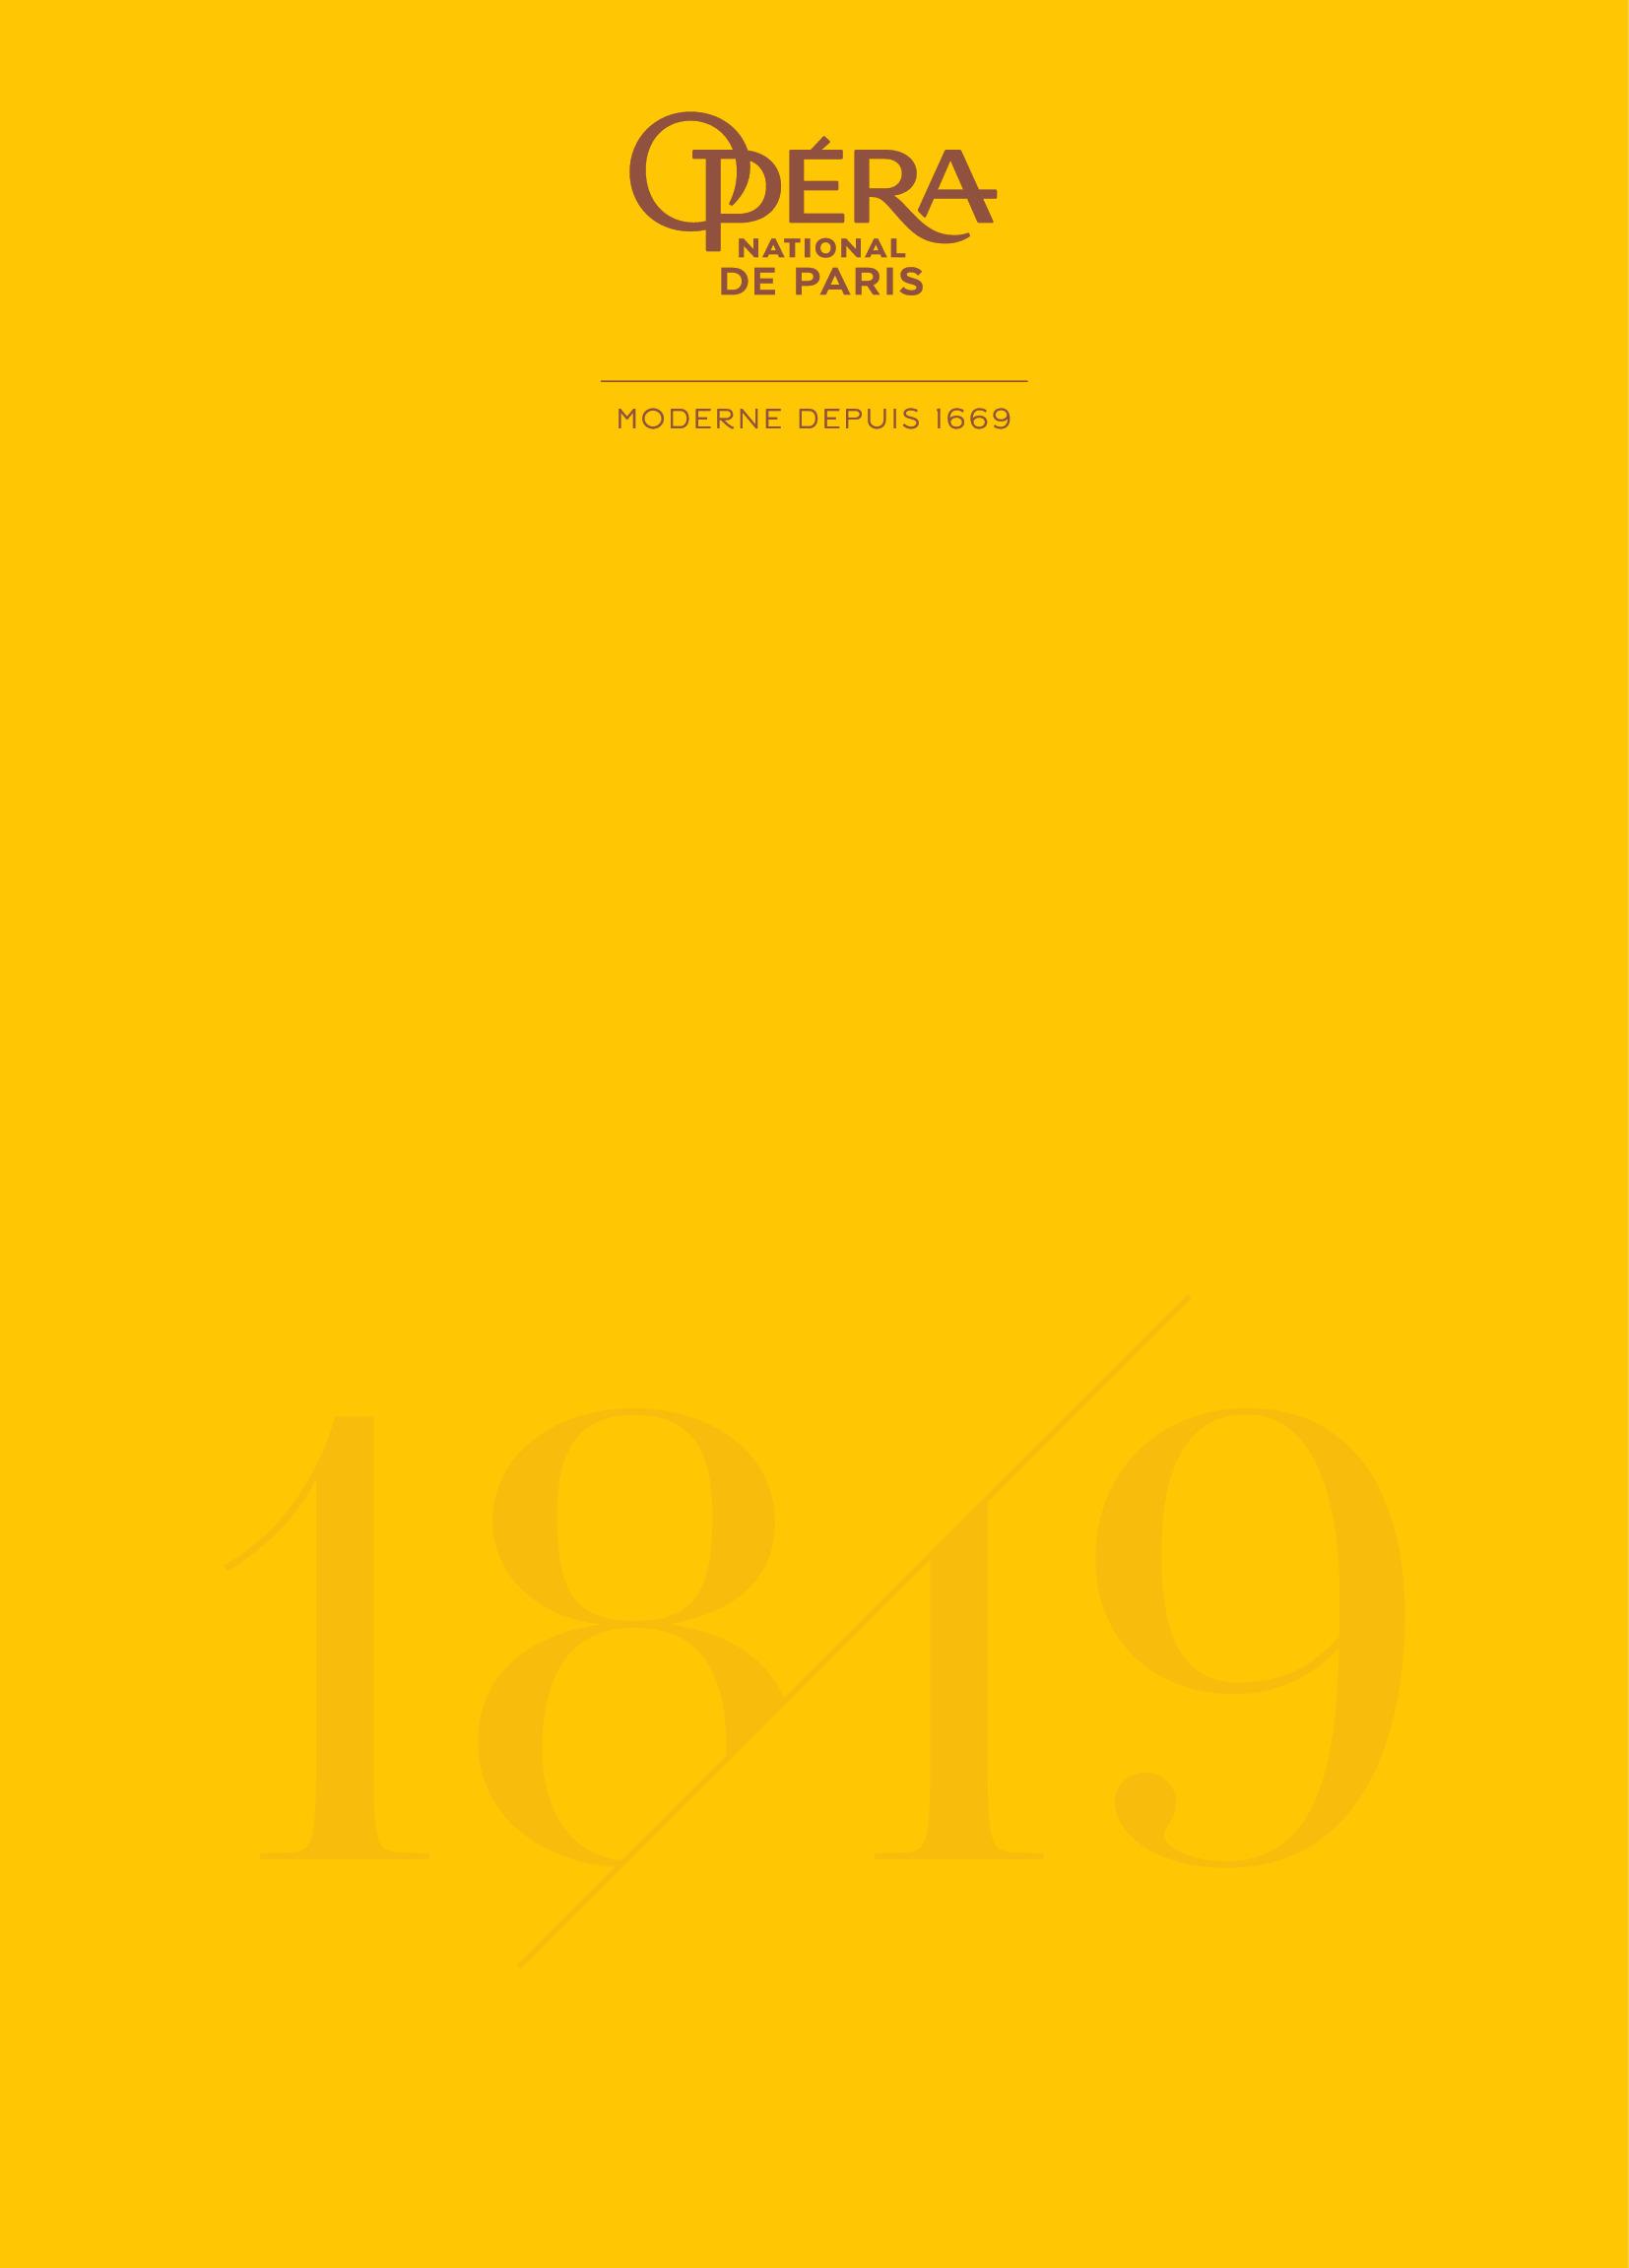 Opéra national de Paris - Brochure de saison. 2018/2019, Opéra national de Paris  